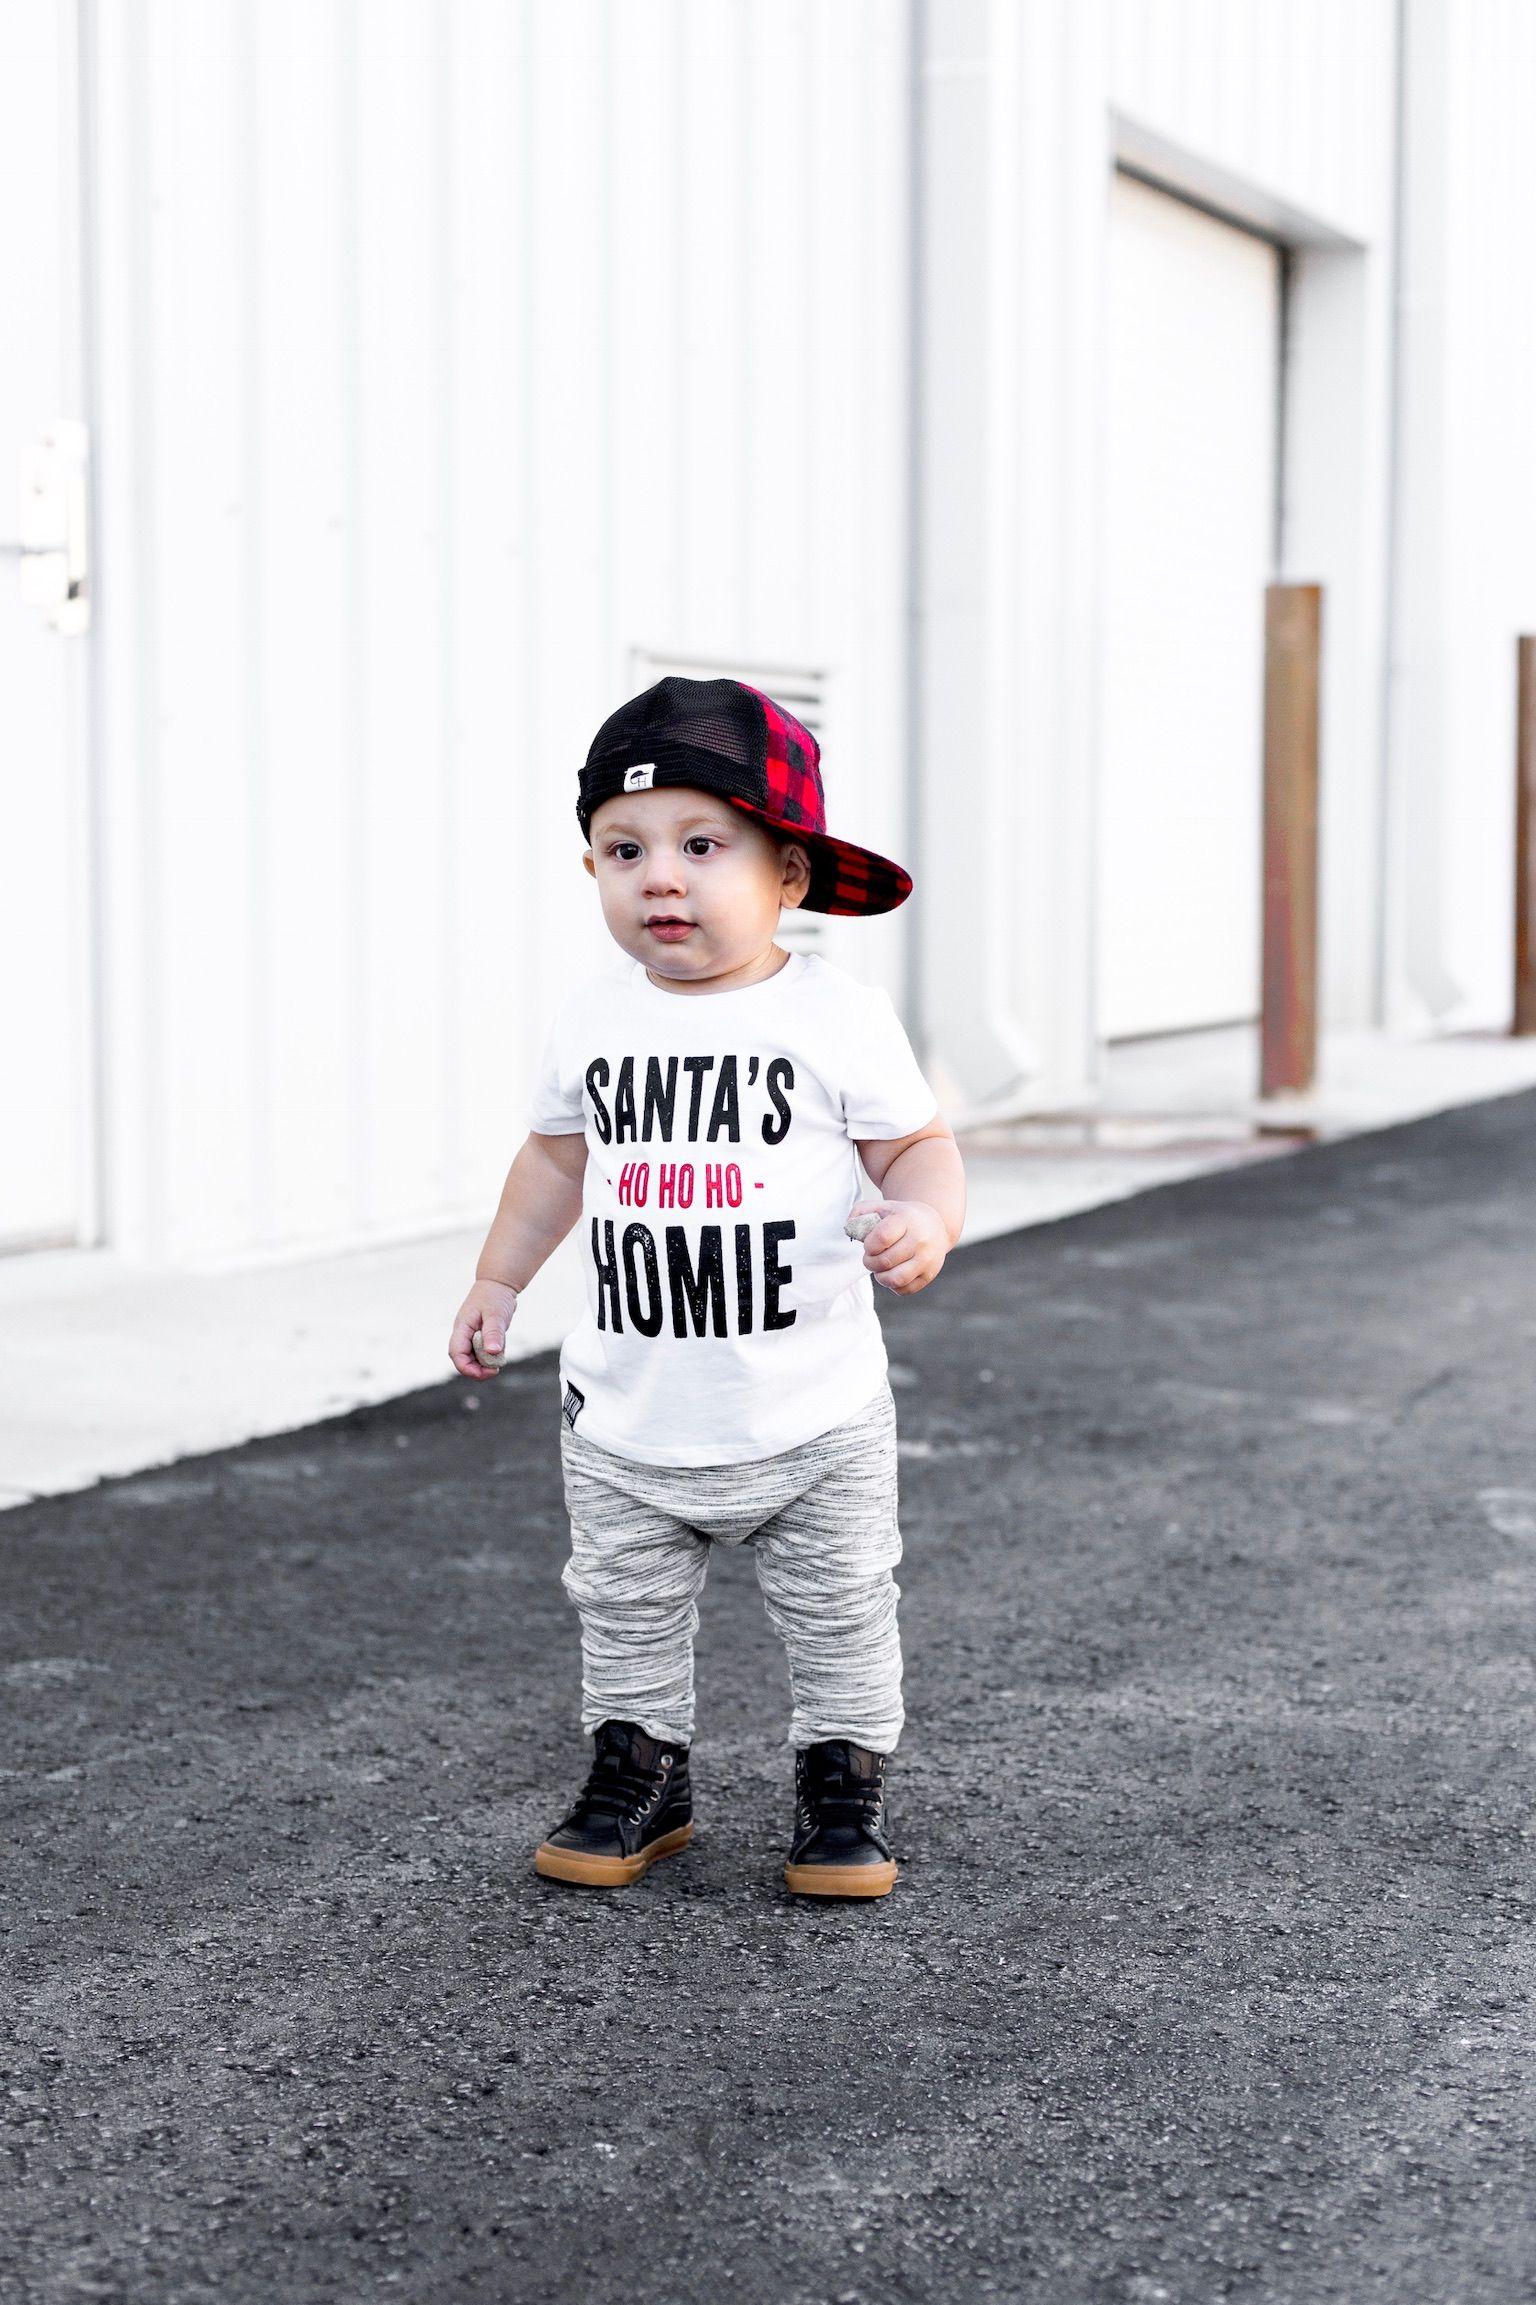 cbd543f3b8 toddler christmas shirt kids fashion buffalo plaid vans sk8 hi top raxtin  clothing co